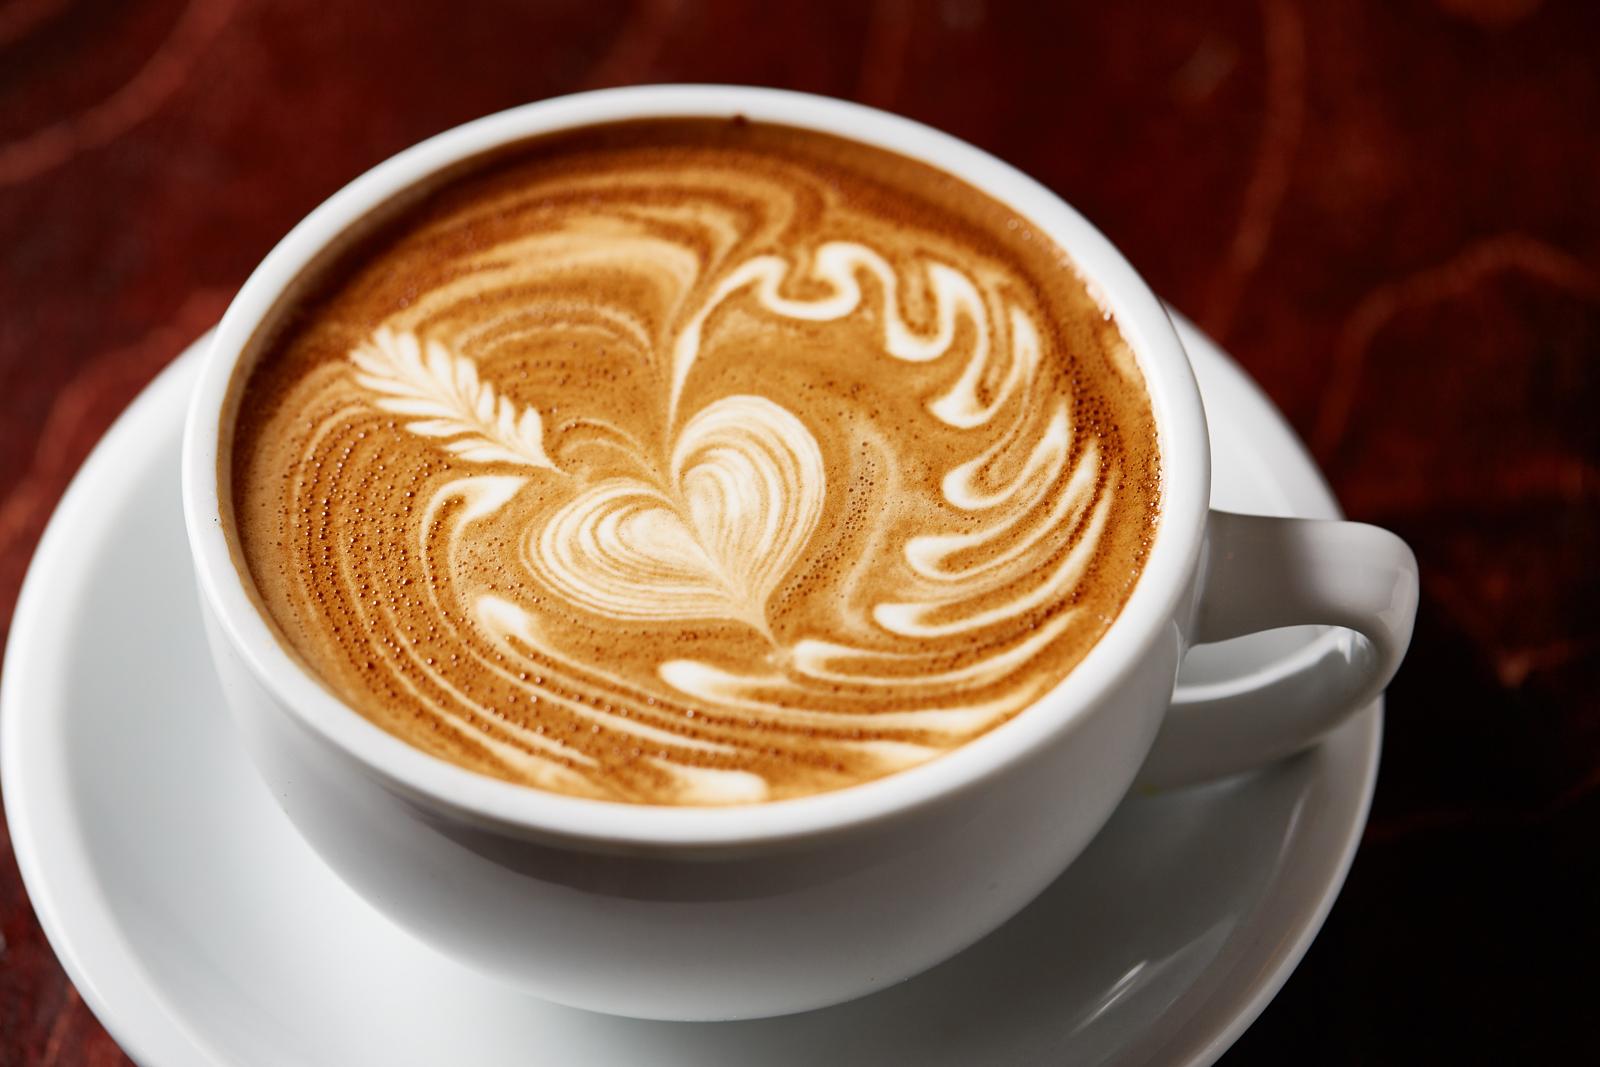 Source: http://sawadacoffee.com/wp-content/uploads/Sawada-Coffee-10DEC2015-003.jpg